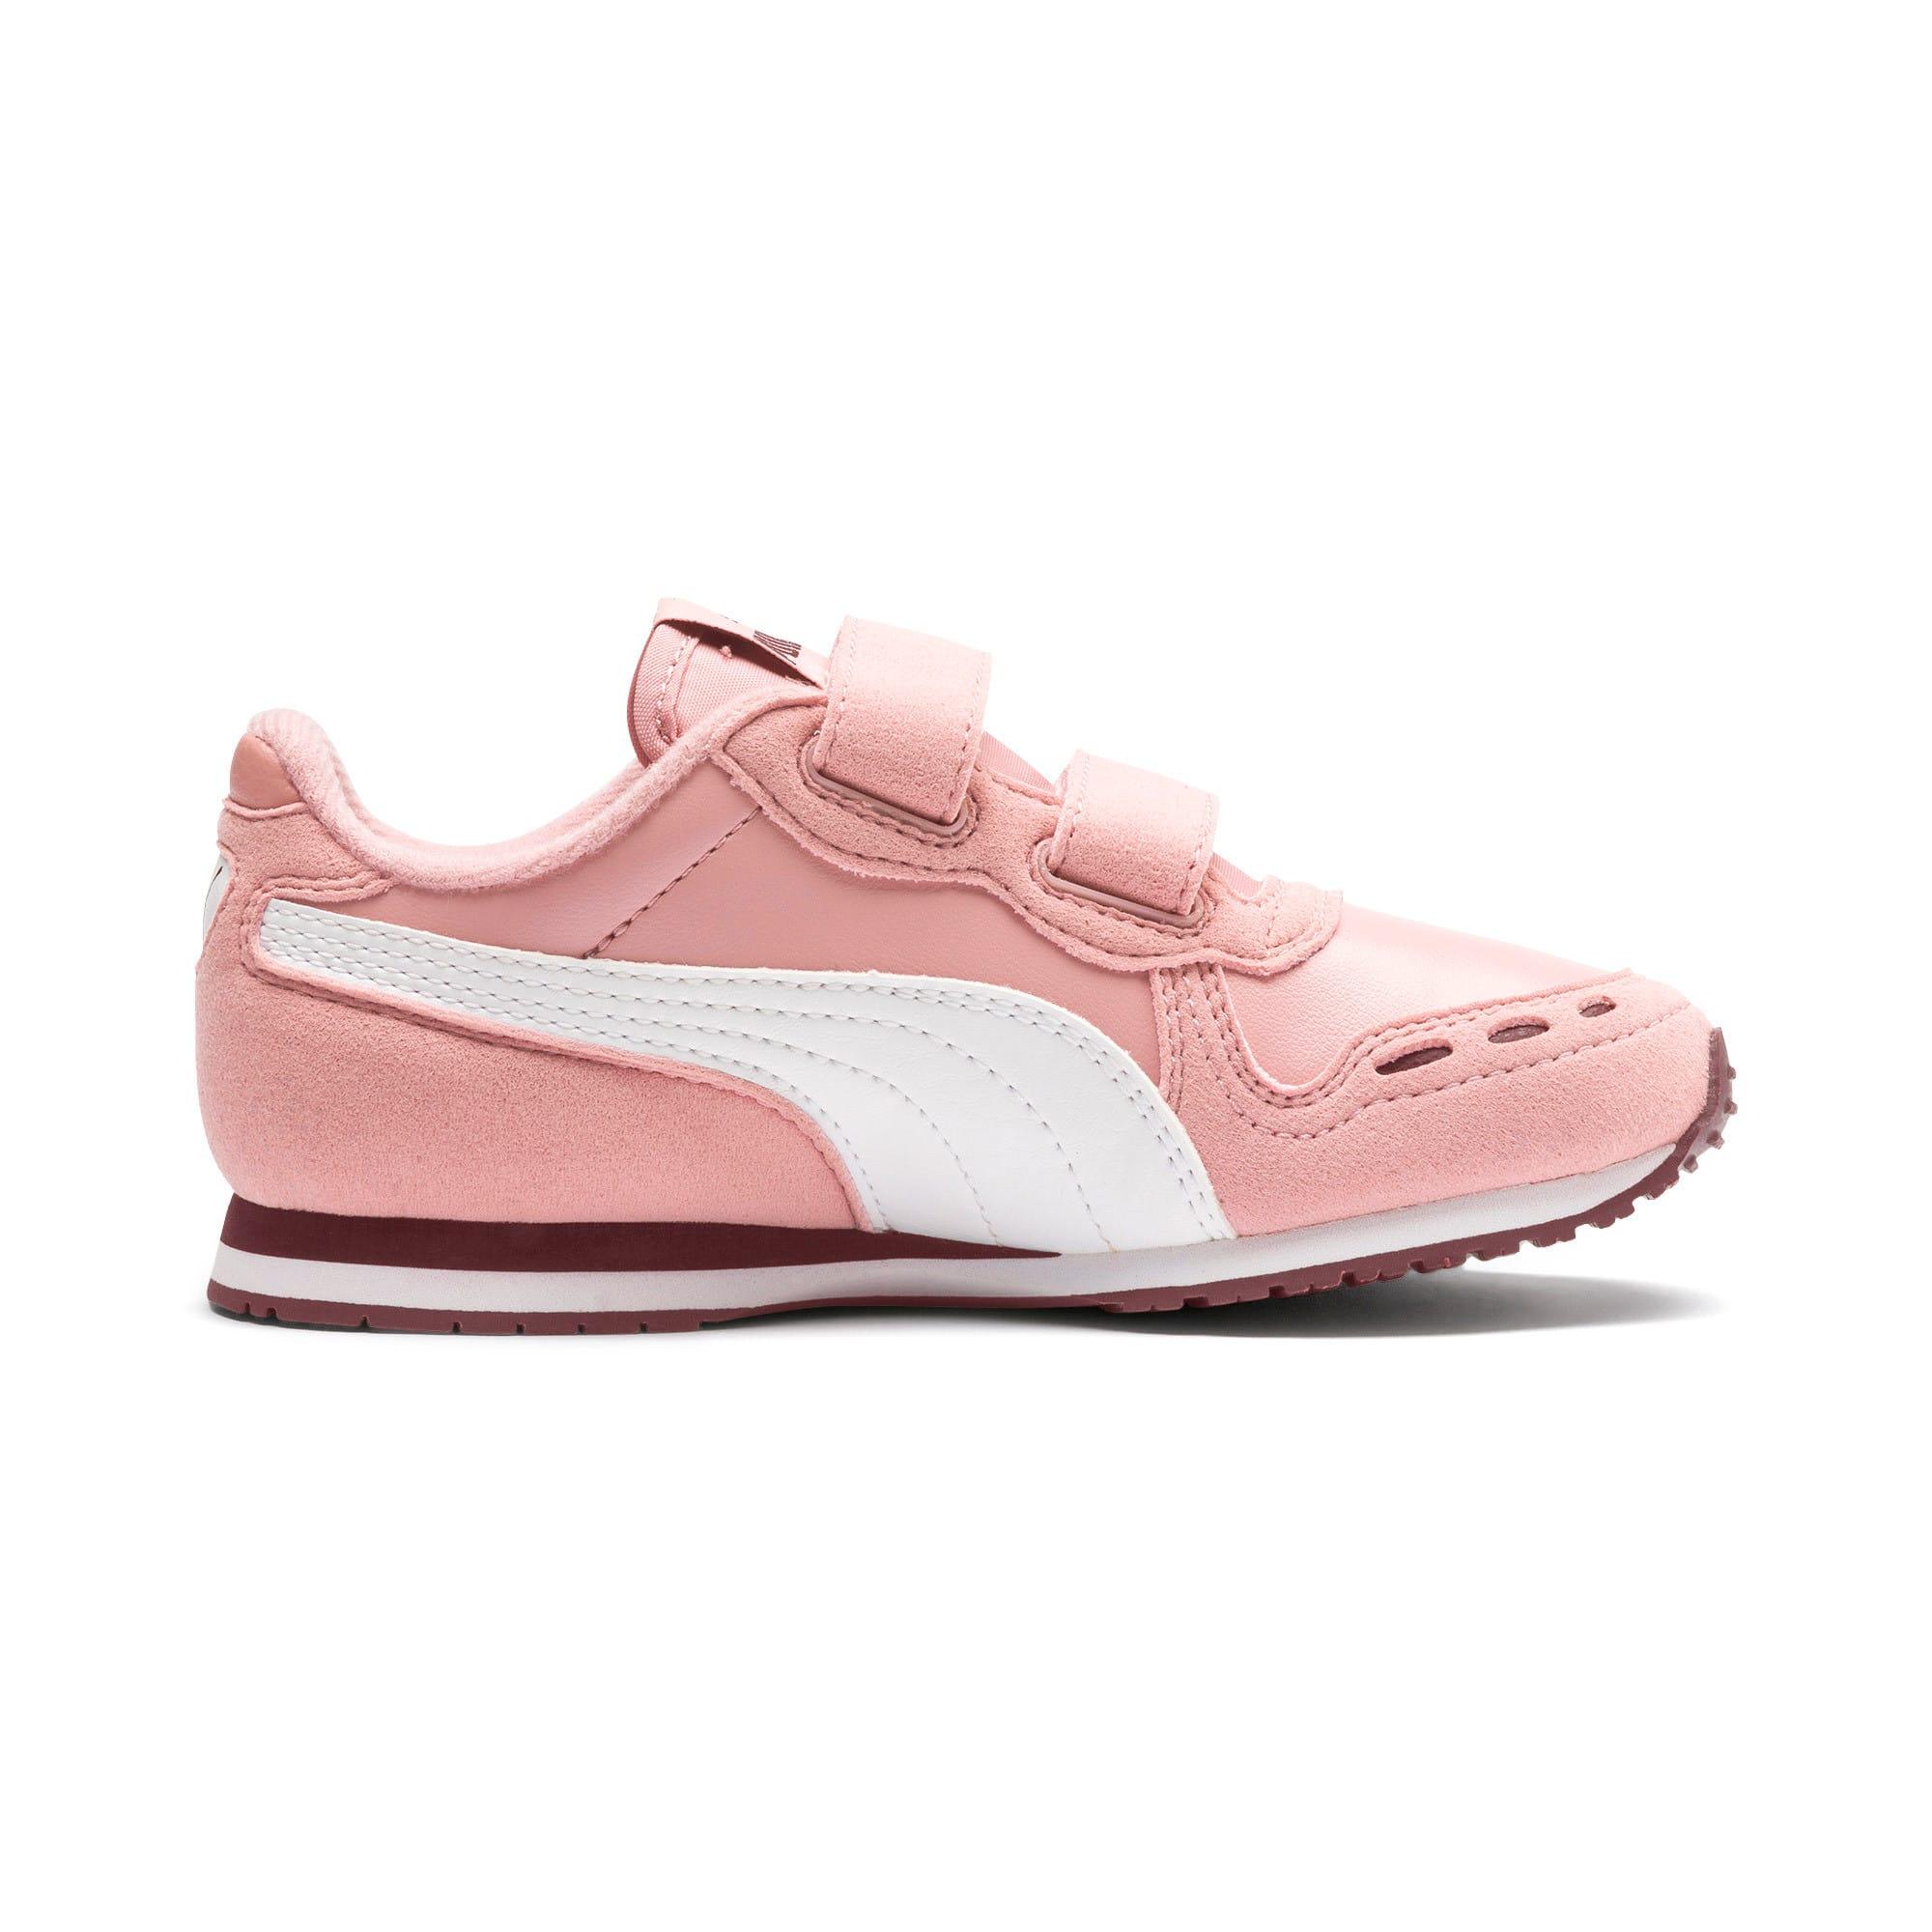 Thumbnail 5 of Cabana Racer SL V PS Baby Sneaker, Bridal Rose-Puma White, medium